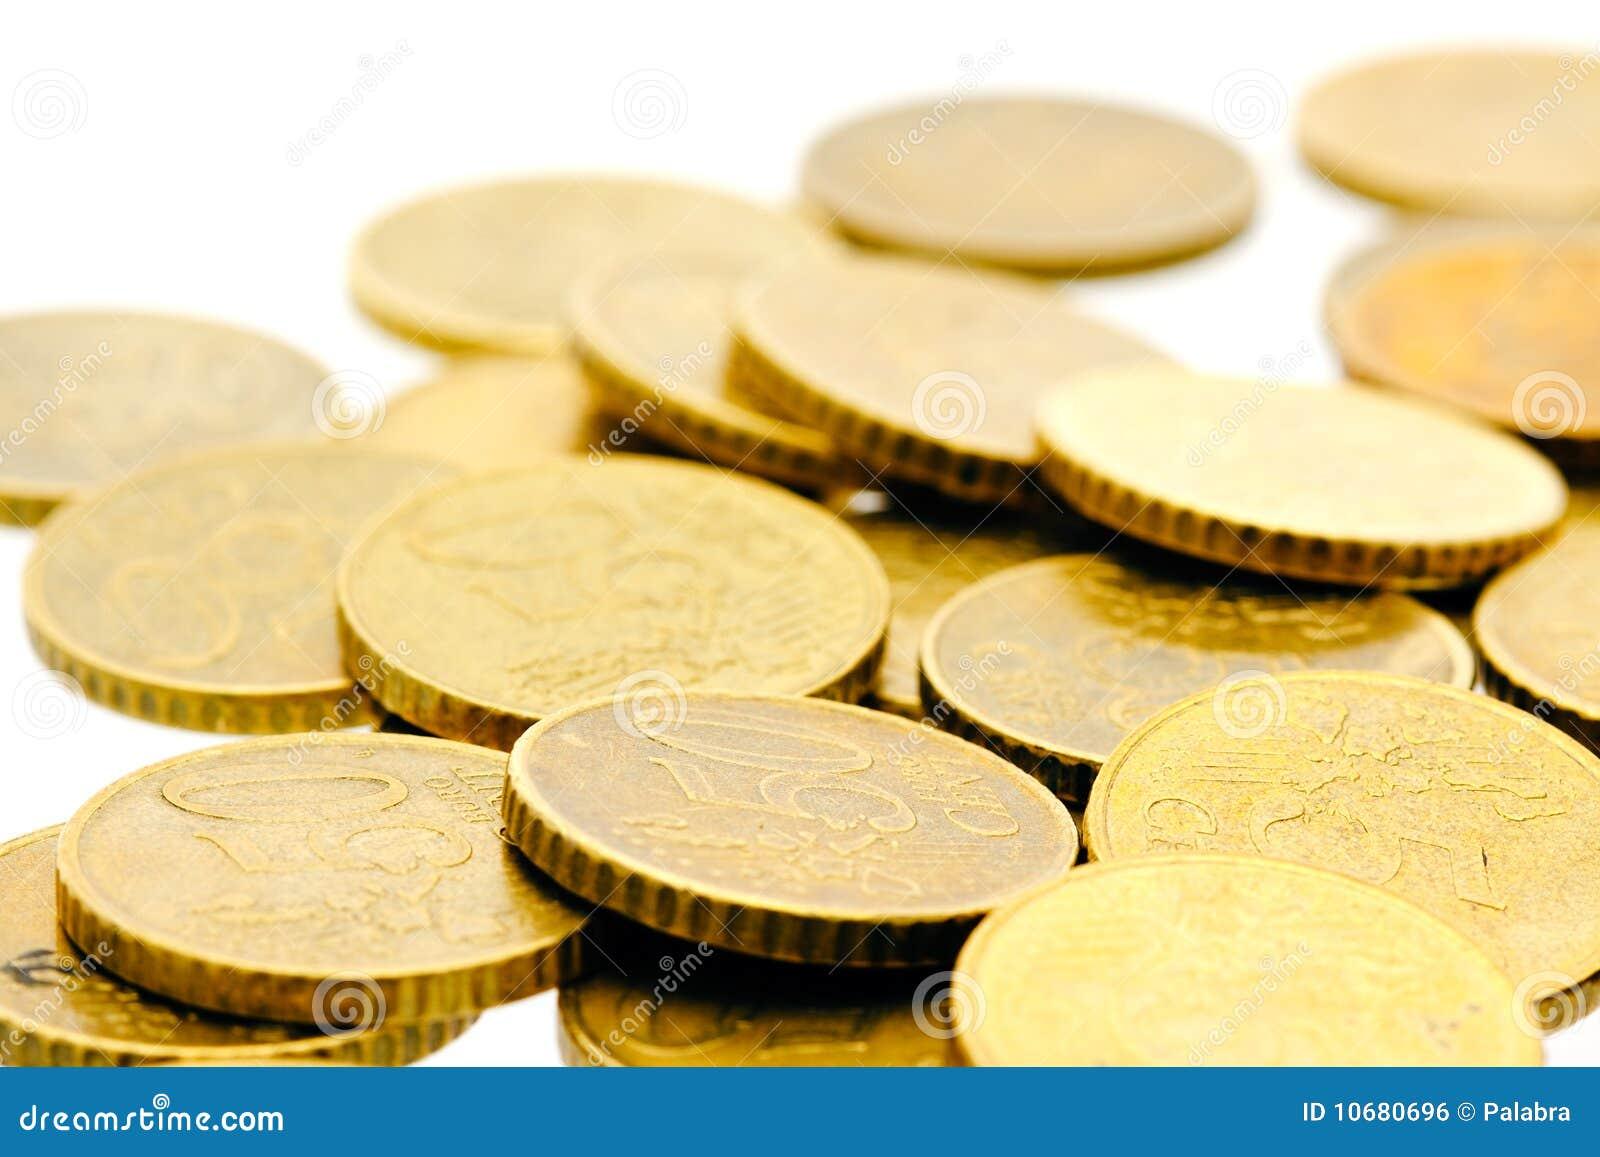 50 euro cent coins 11